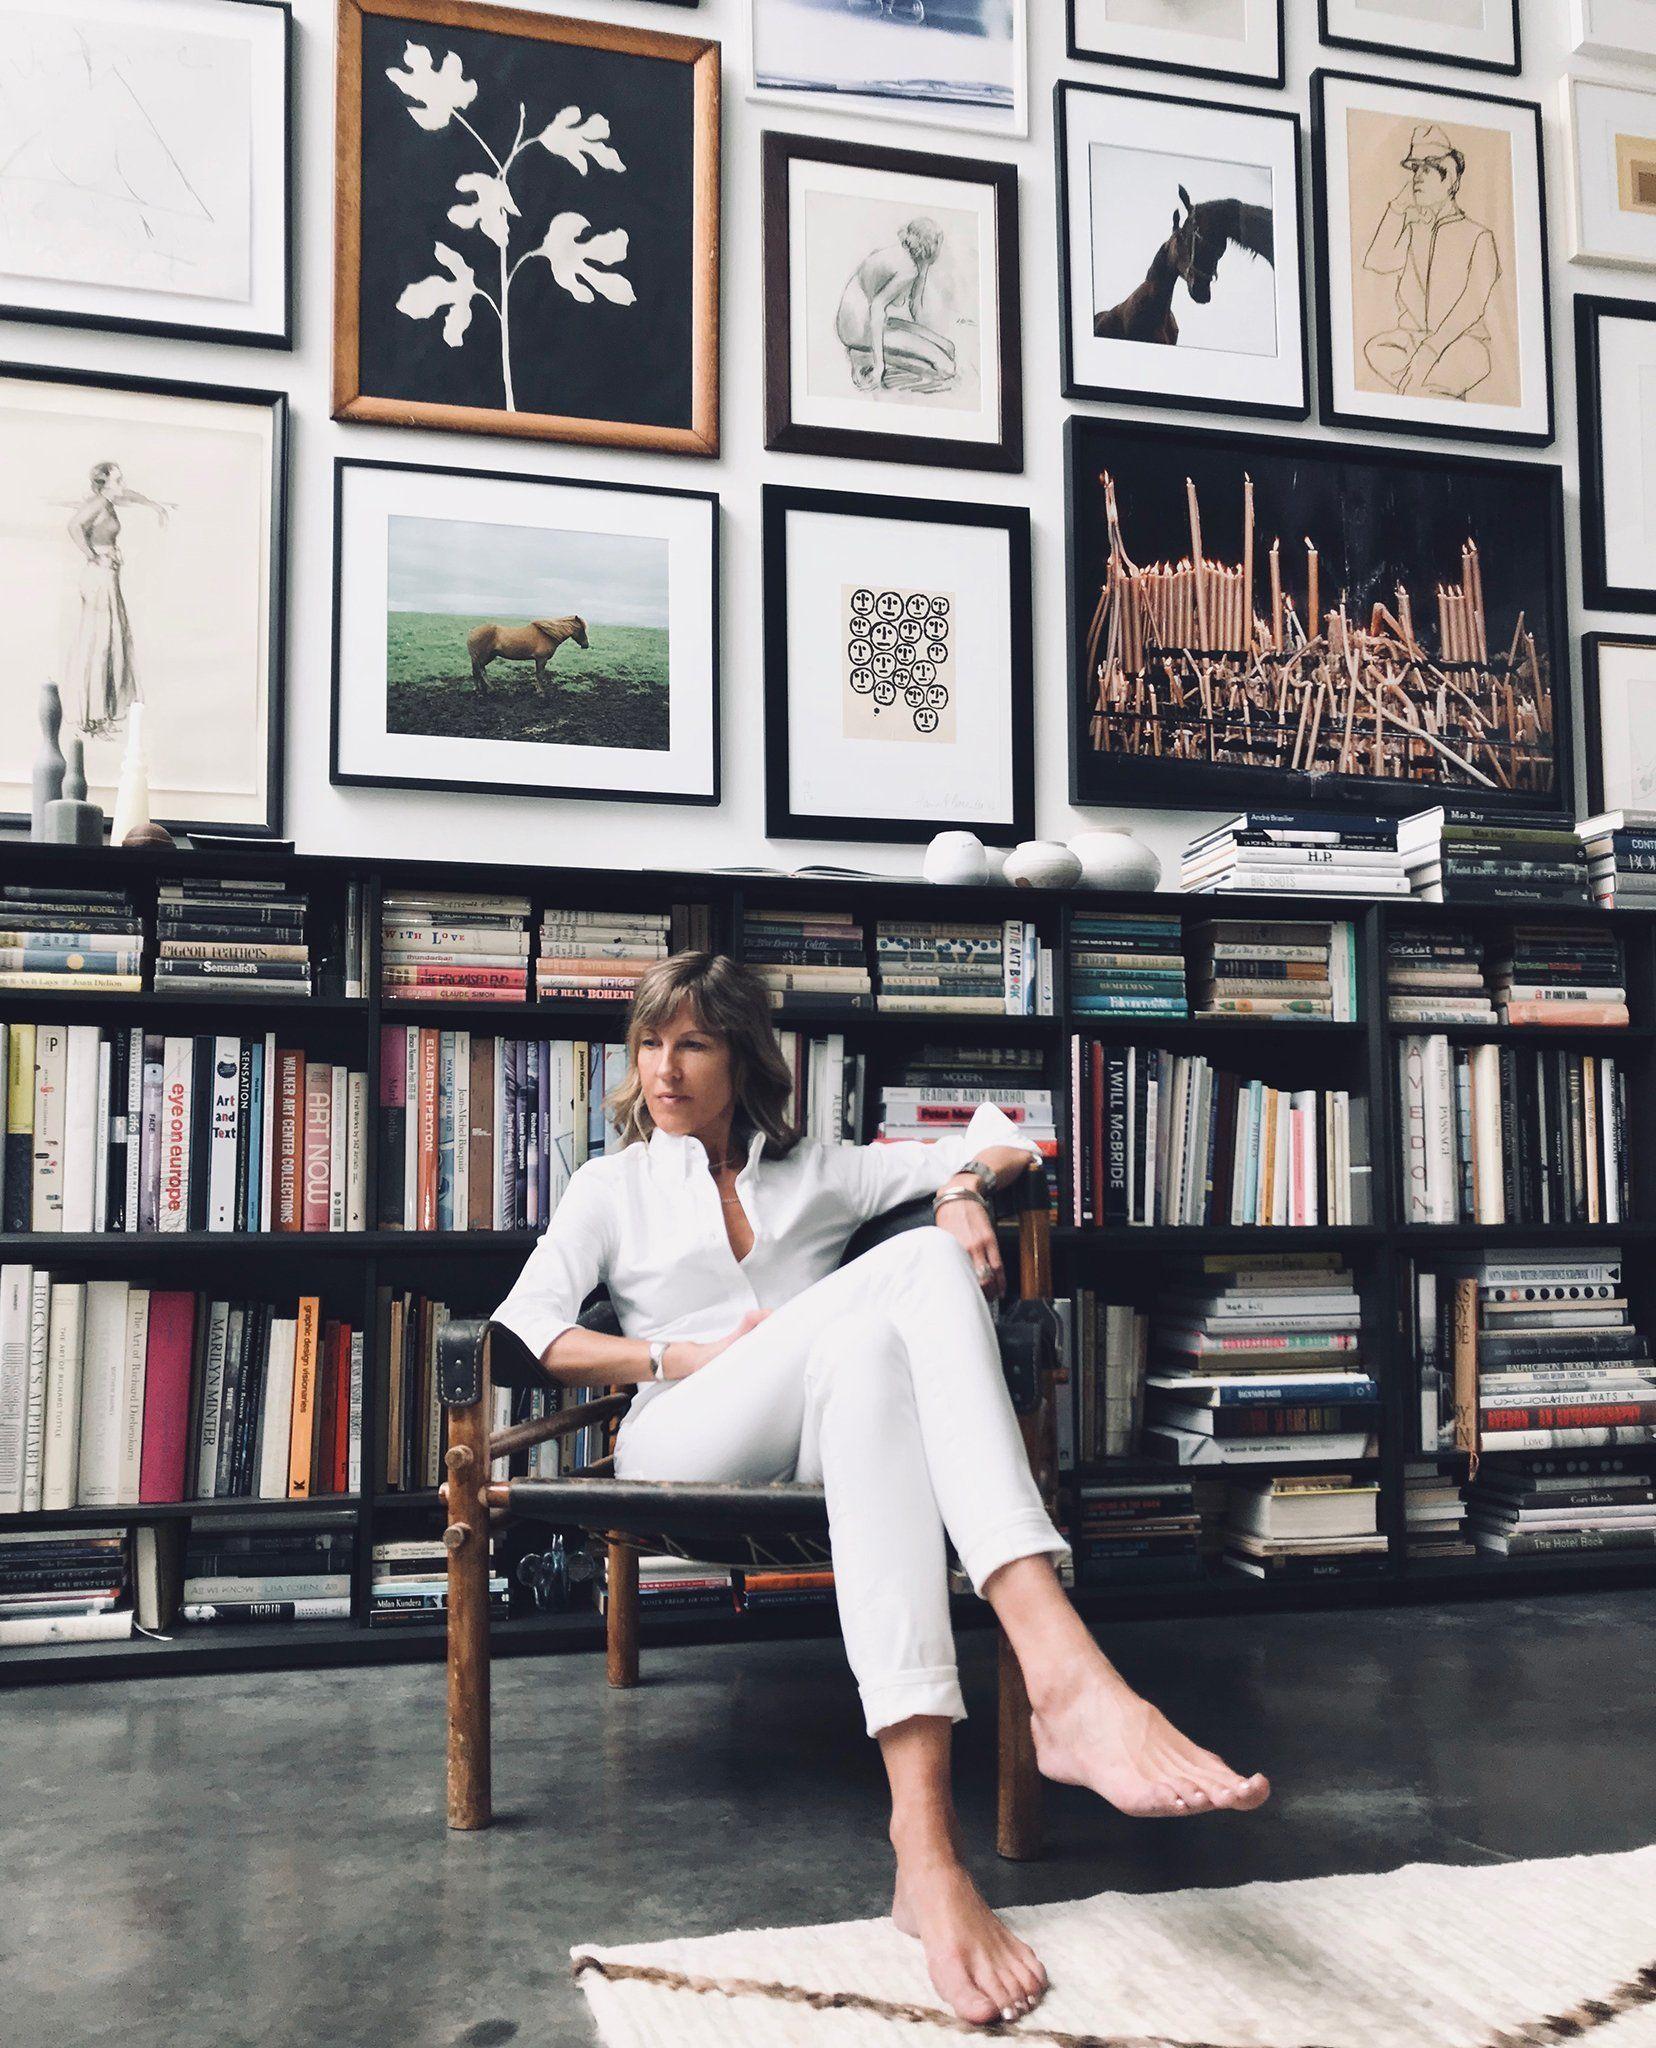 Julia Leach in a room full of books and visuals